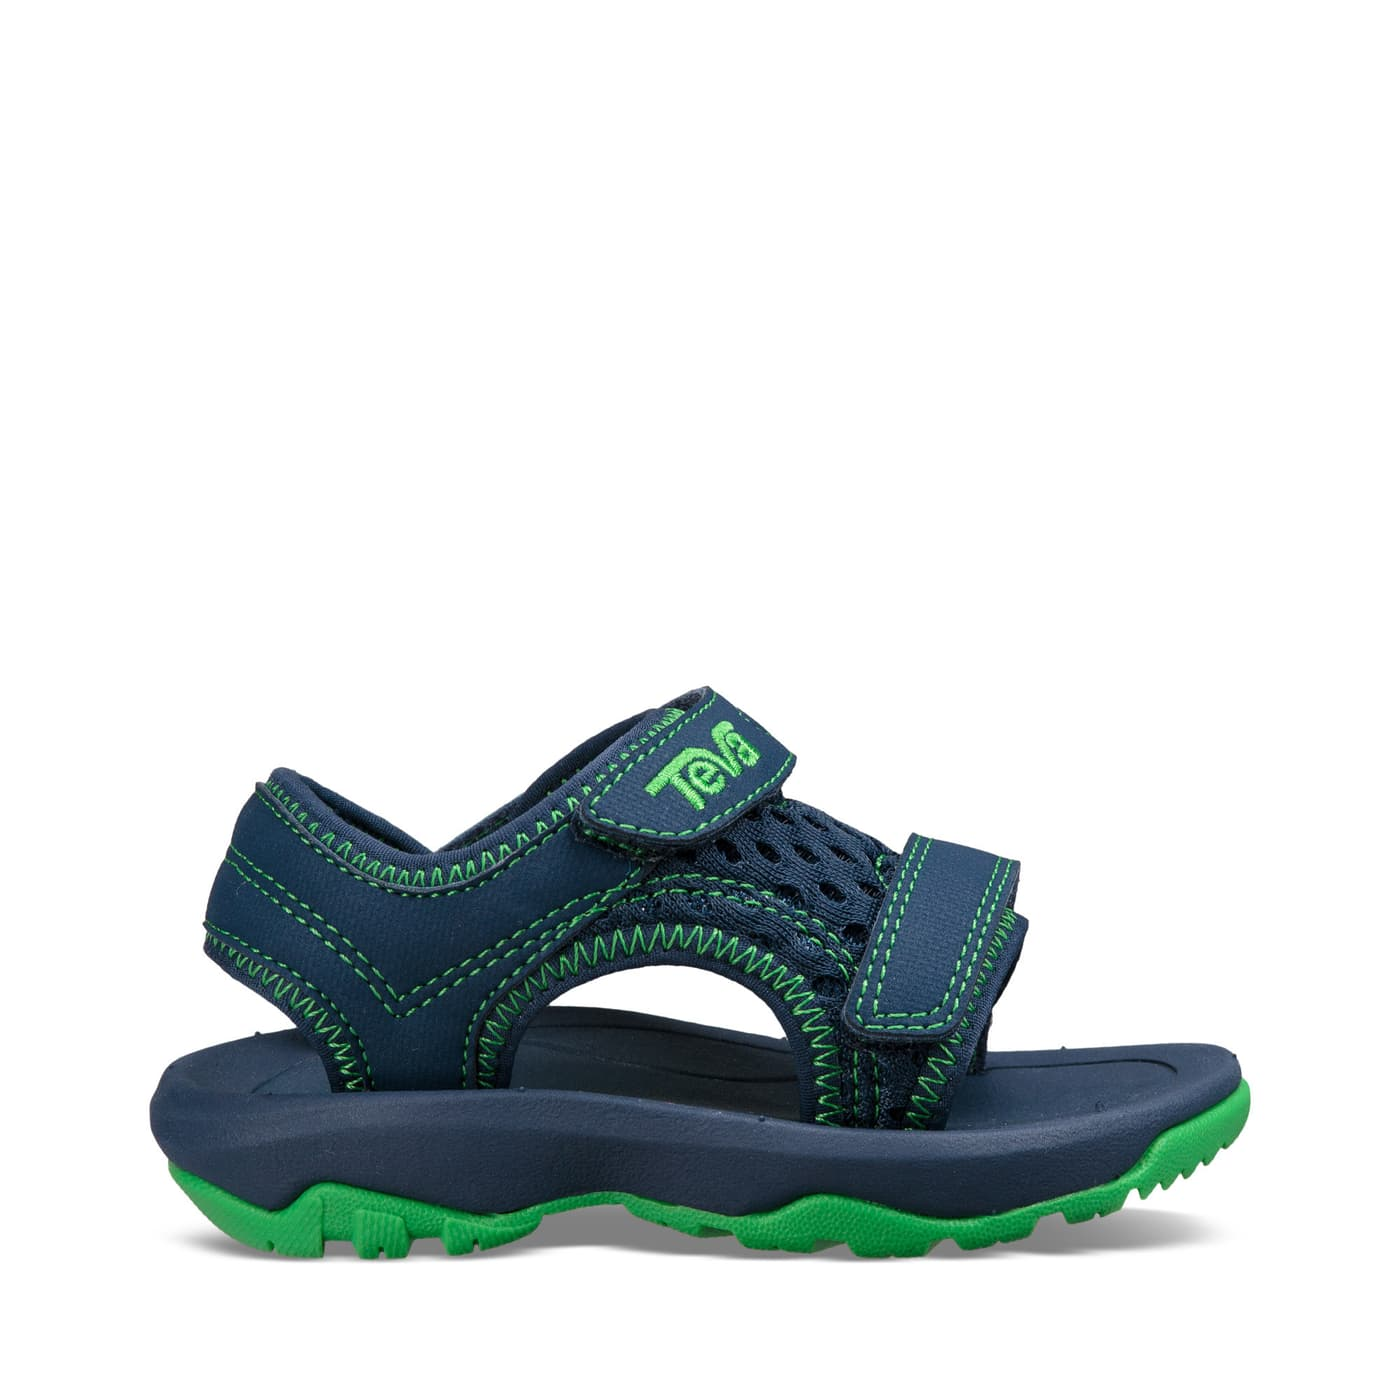 adidas sweatjacke, adidas Kinder Sandalen Disney Akwah 9